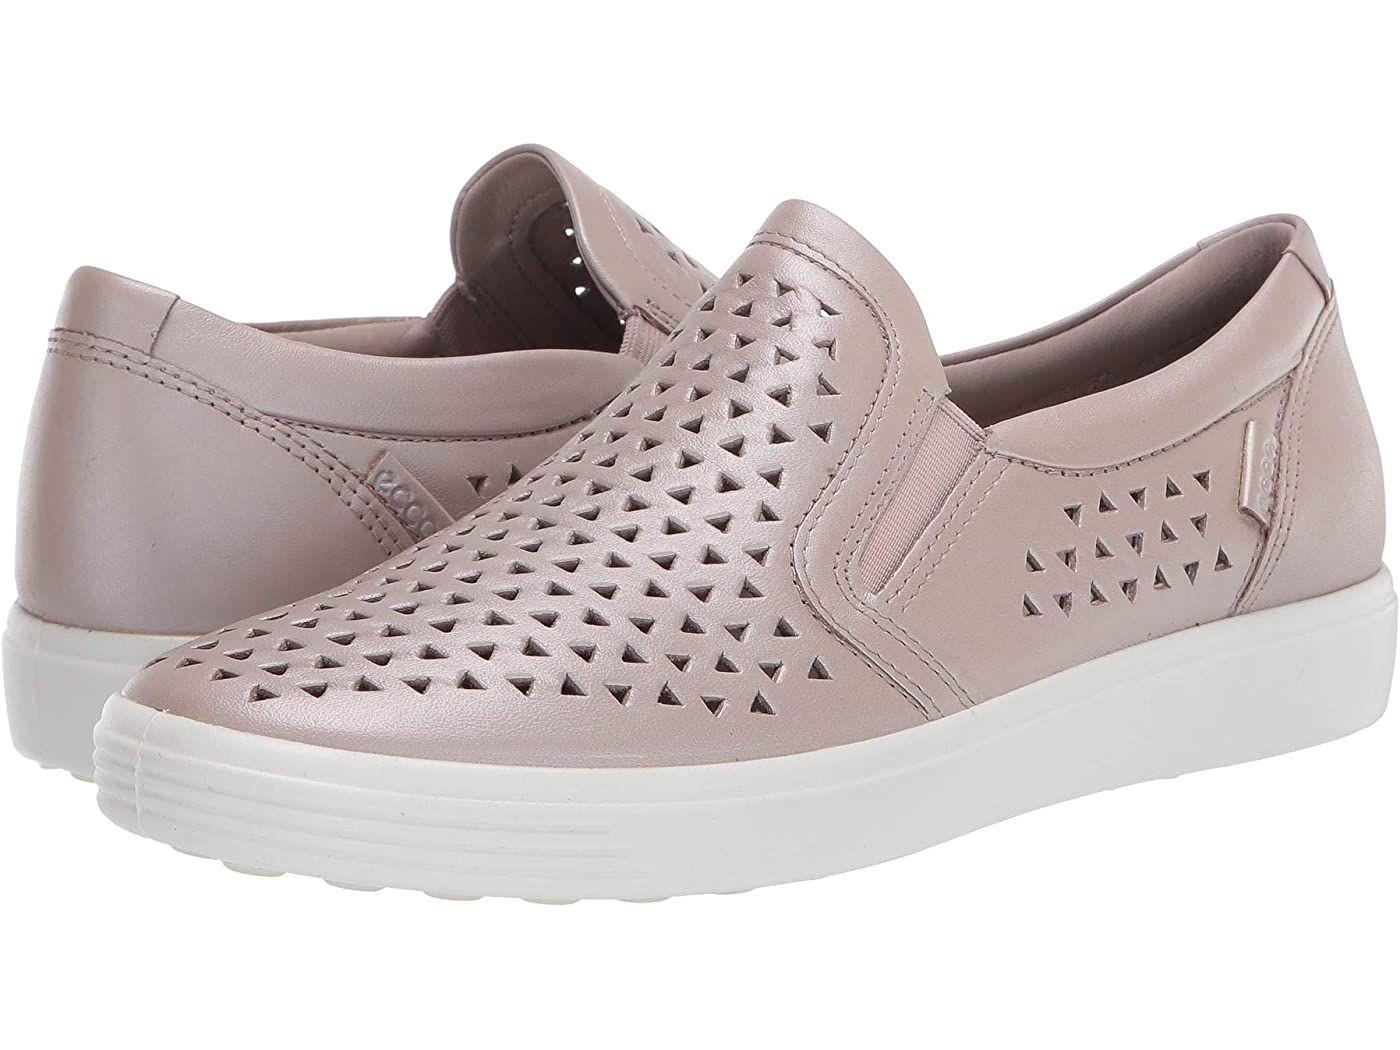 Ecco Soft 7 Slip On Sneakers